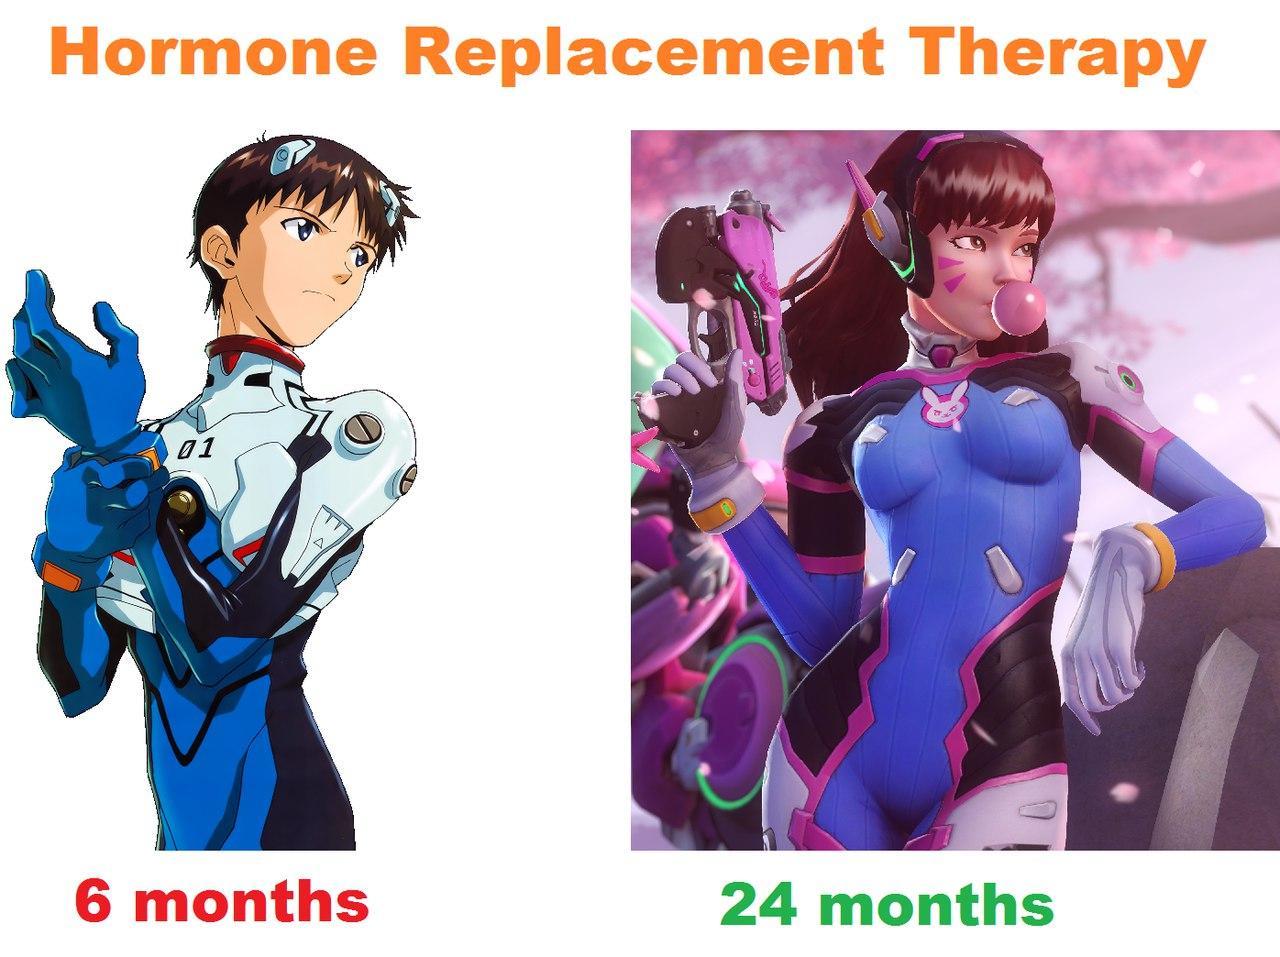 Shinji cum on asukas face doubt. sorry